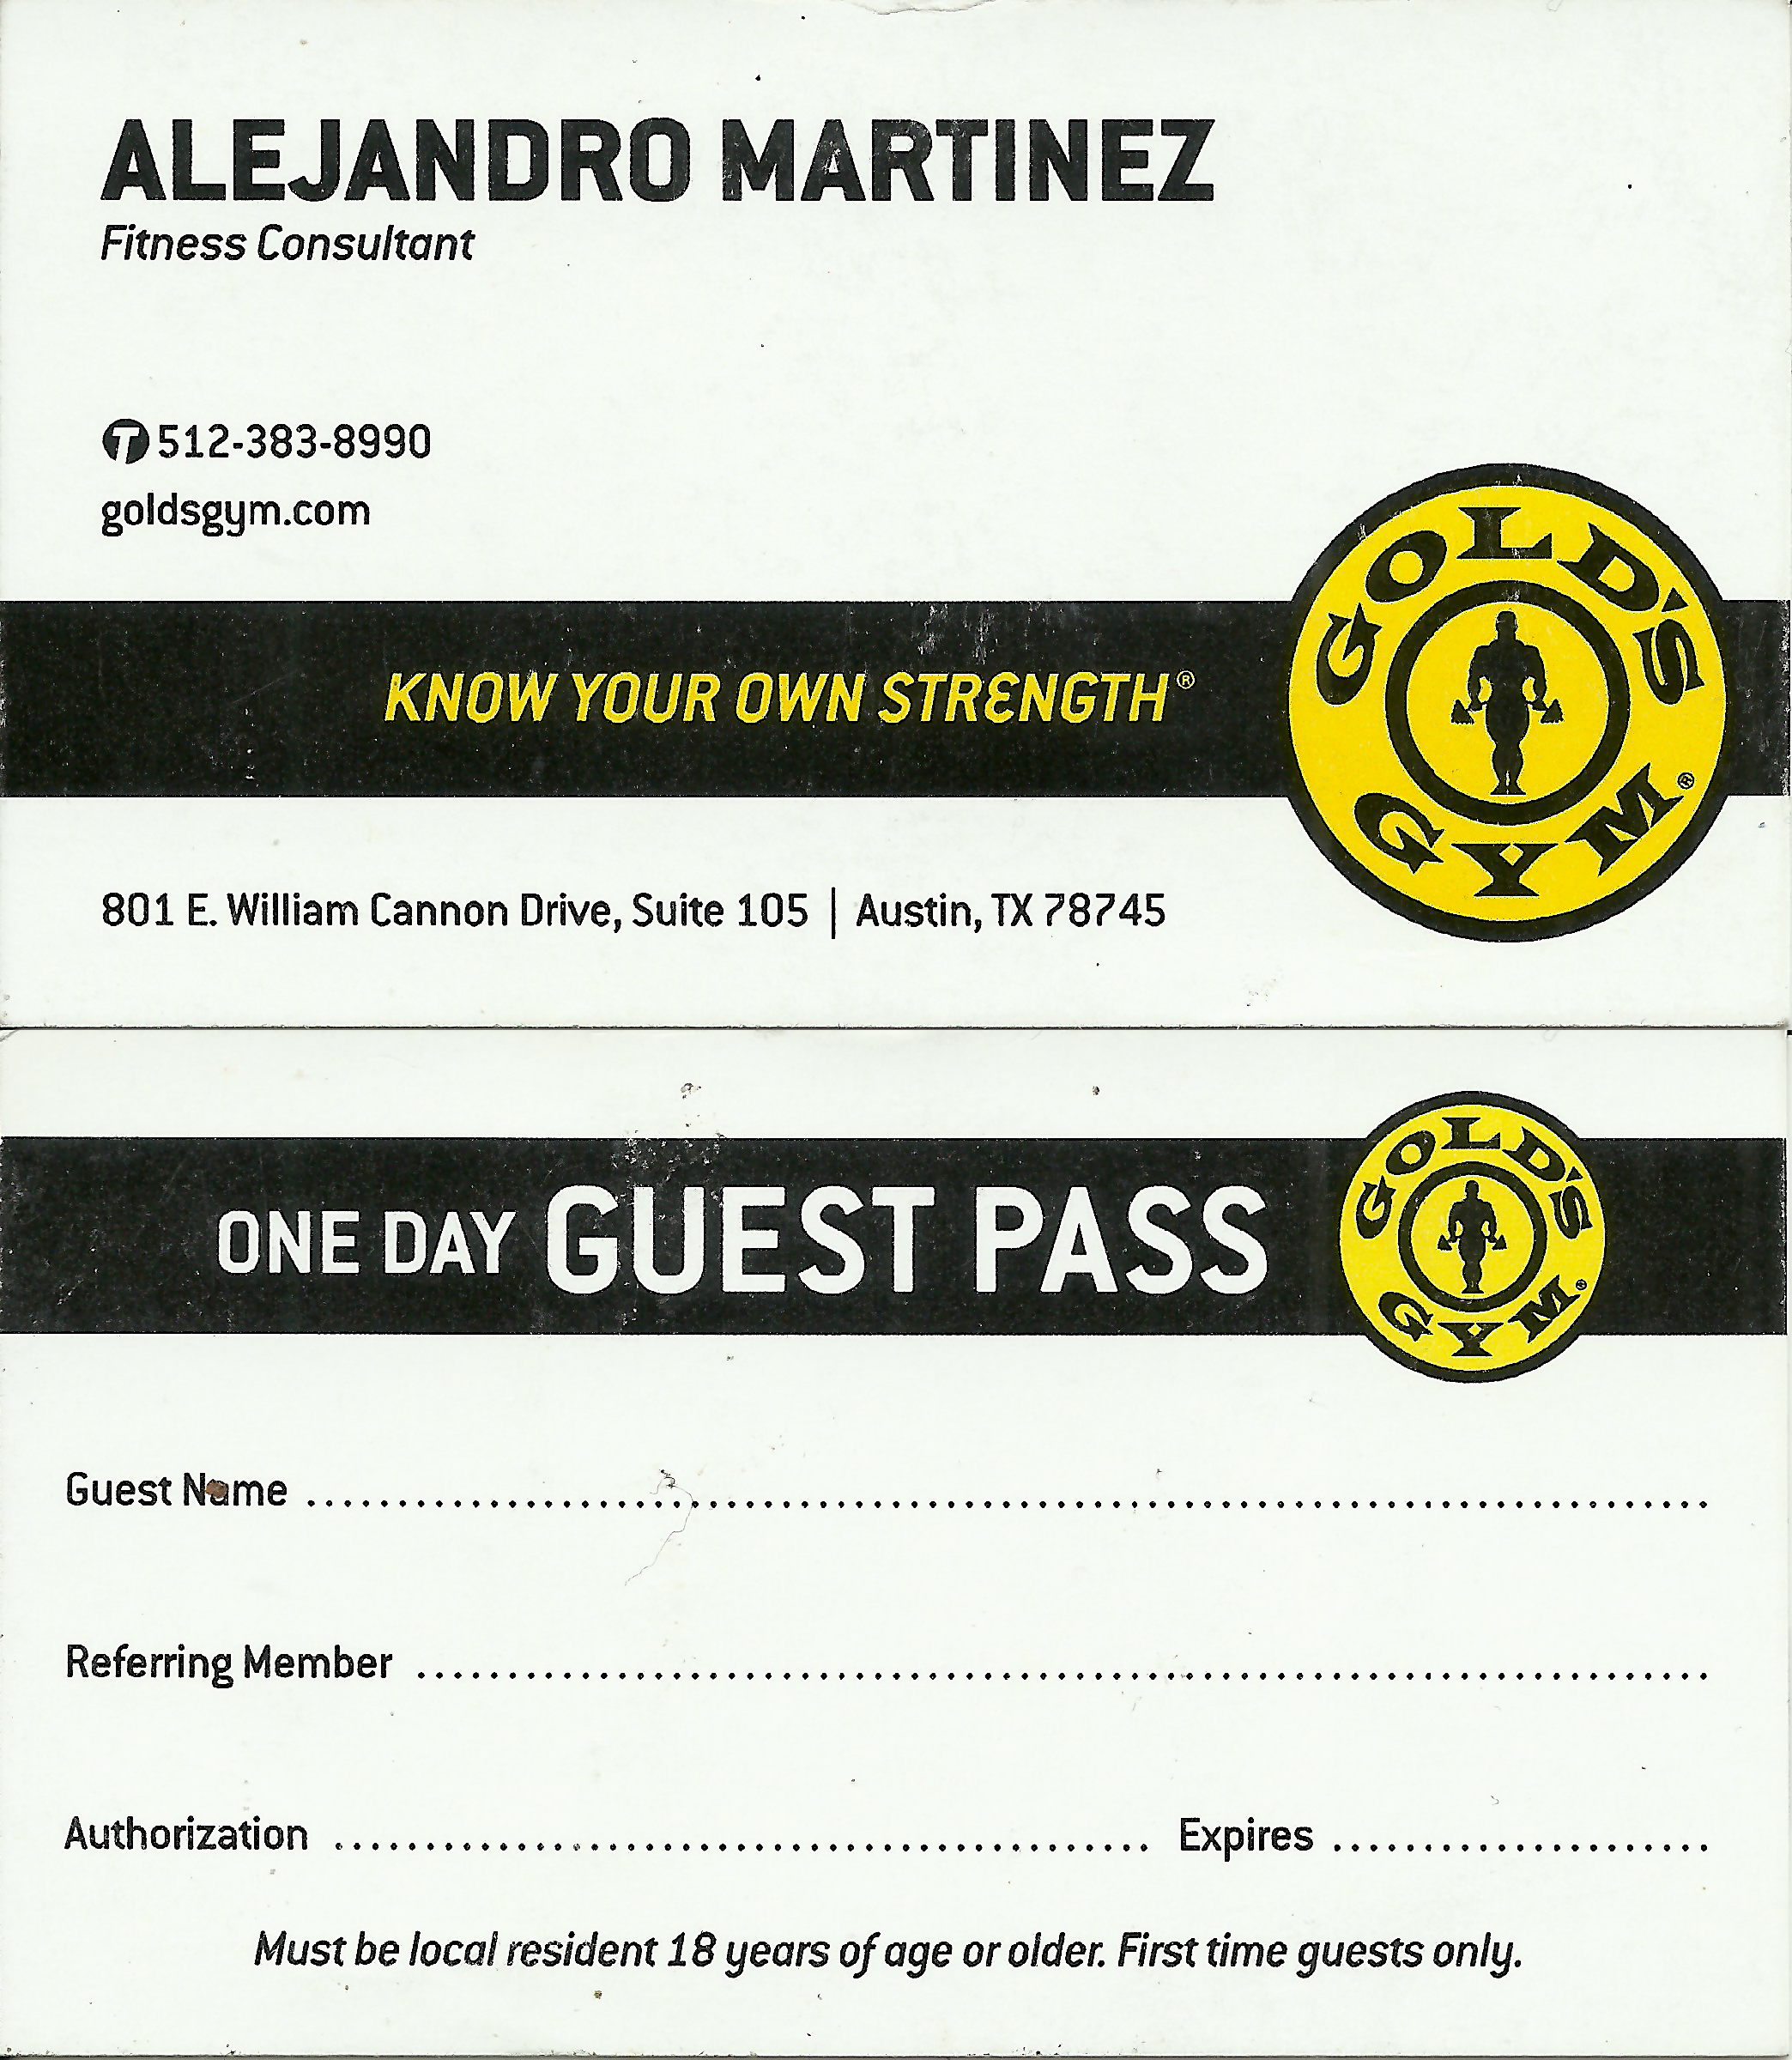 Alejandro martinez golds gym business card example graphic alejandro martinez golds gym business card example graphic design layout one colourmoves